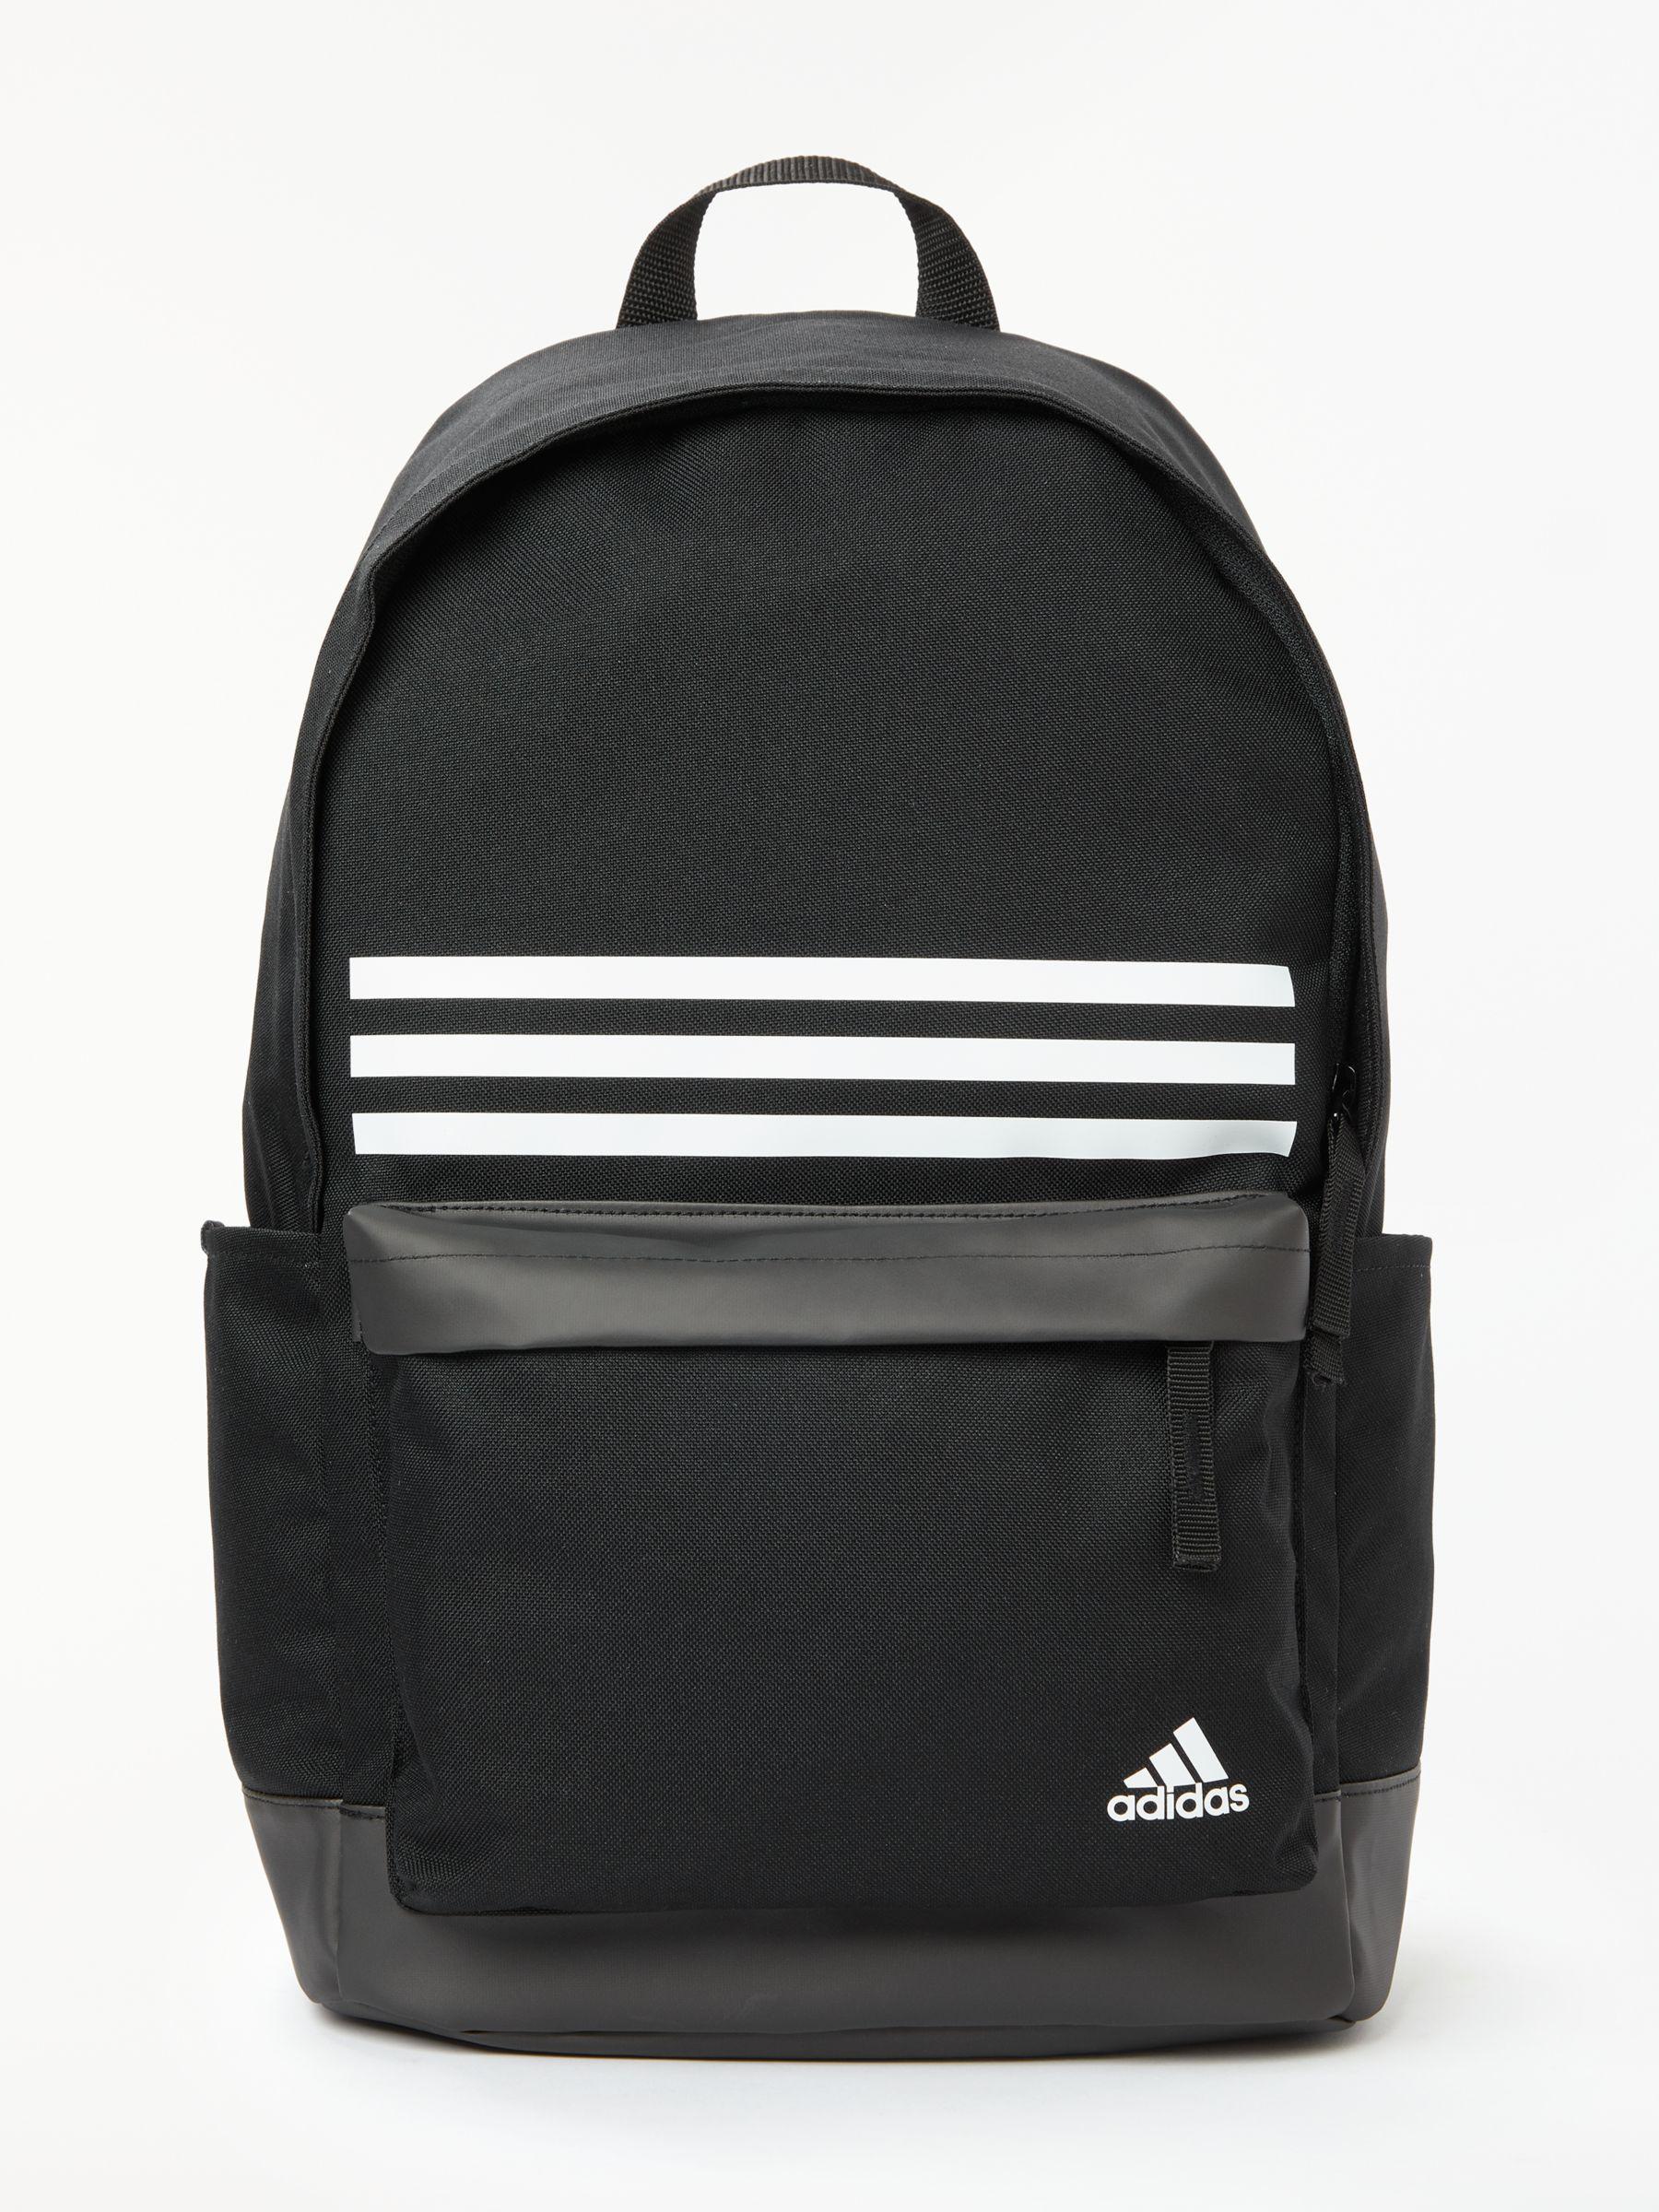 adidas Classic 3-Stripes Pocket Backpack 2f2c998428434